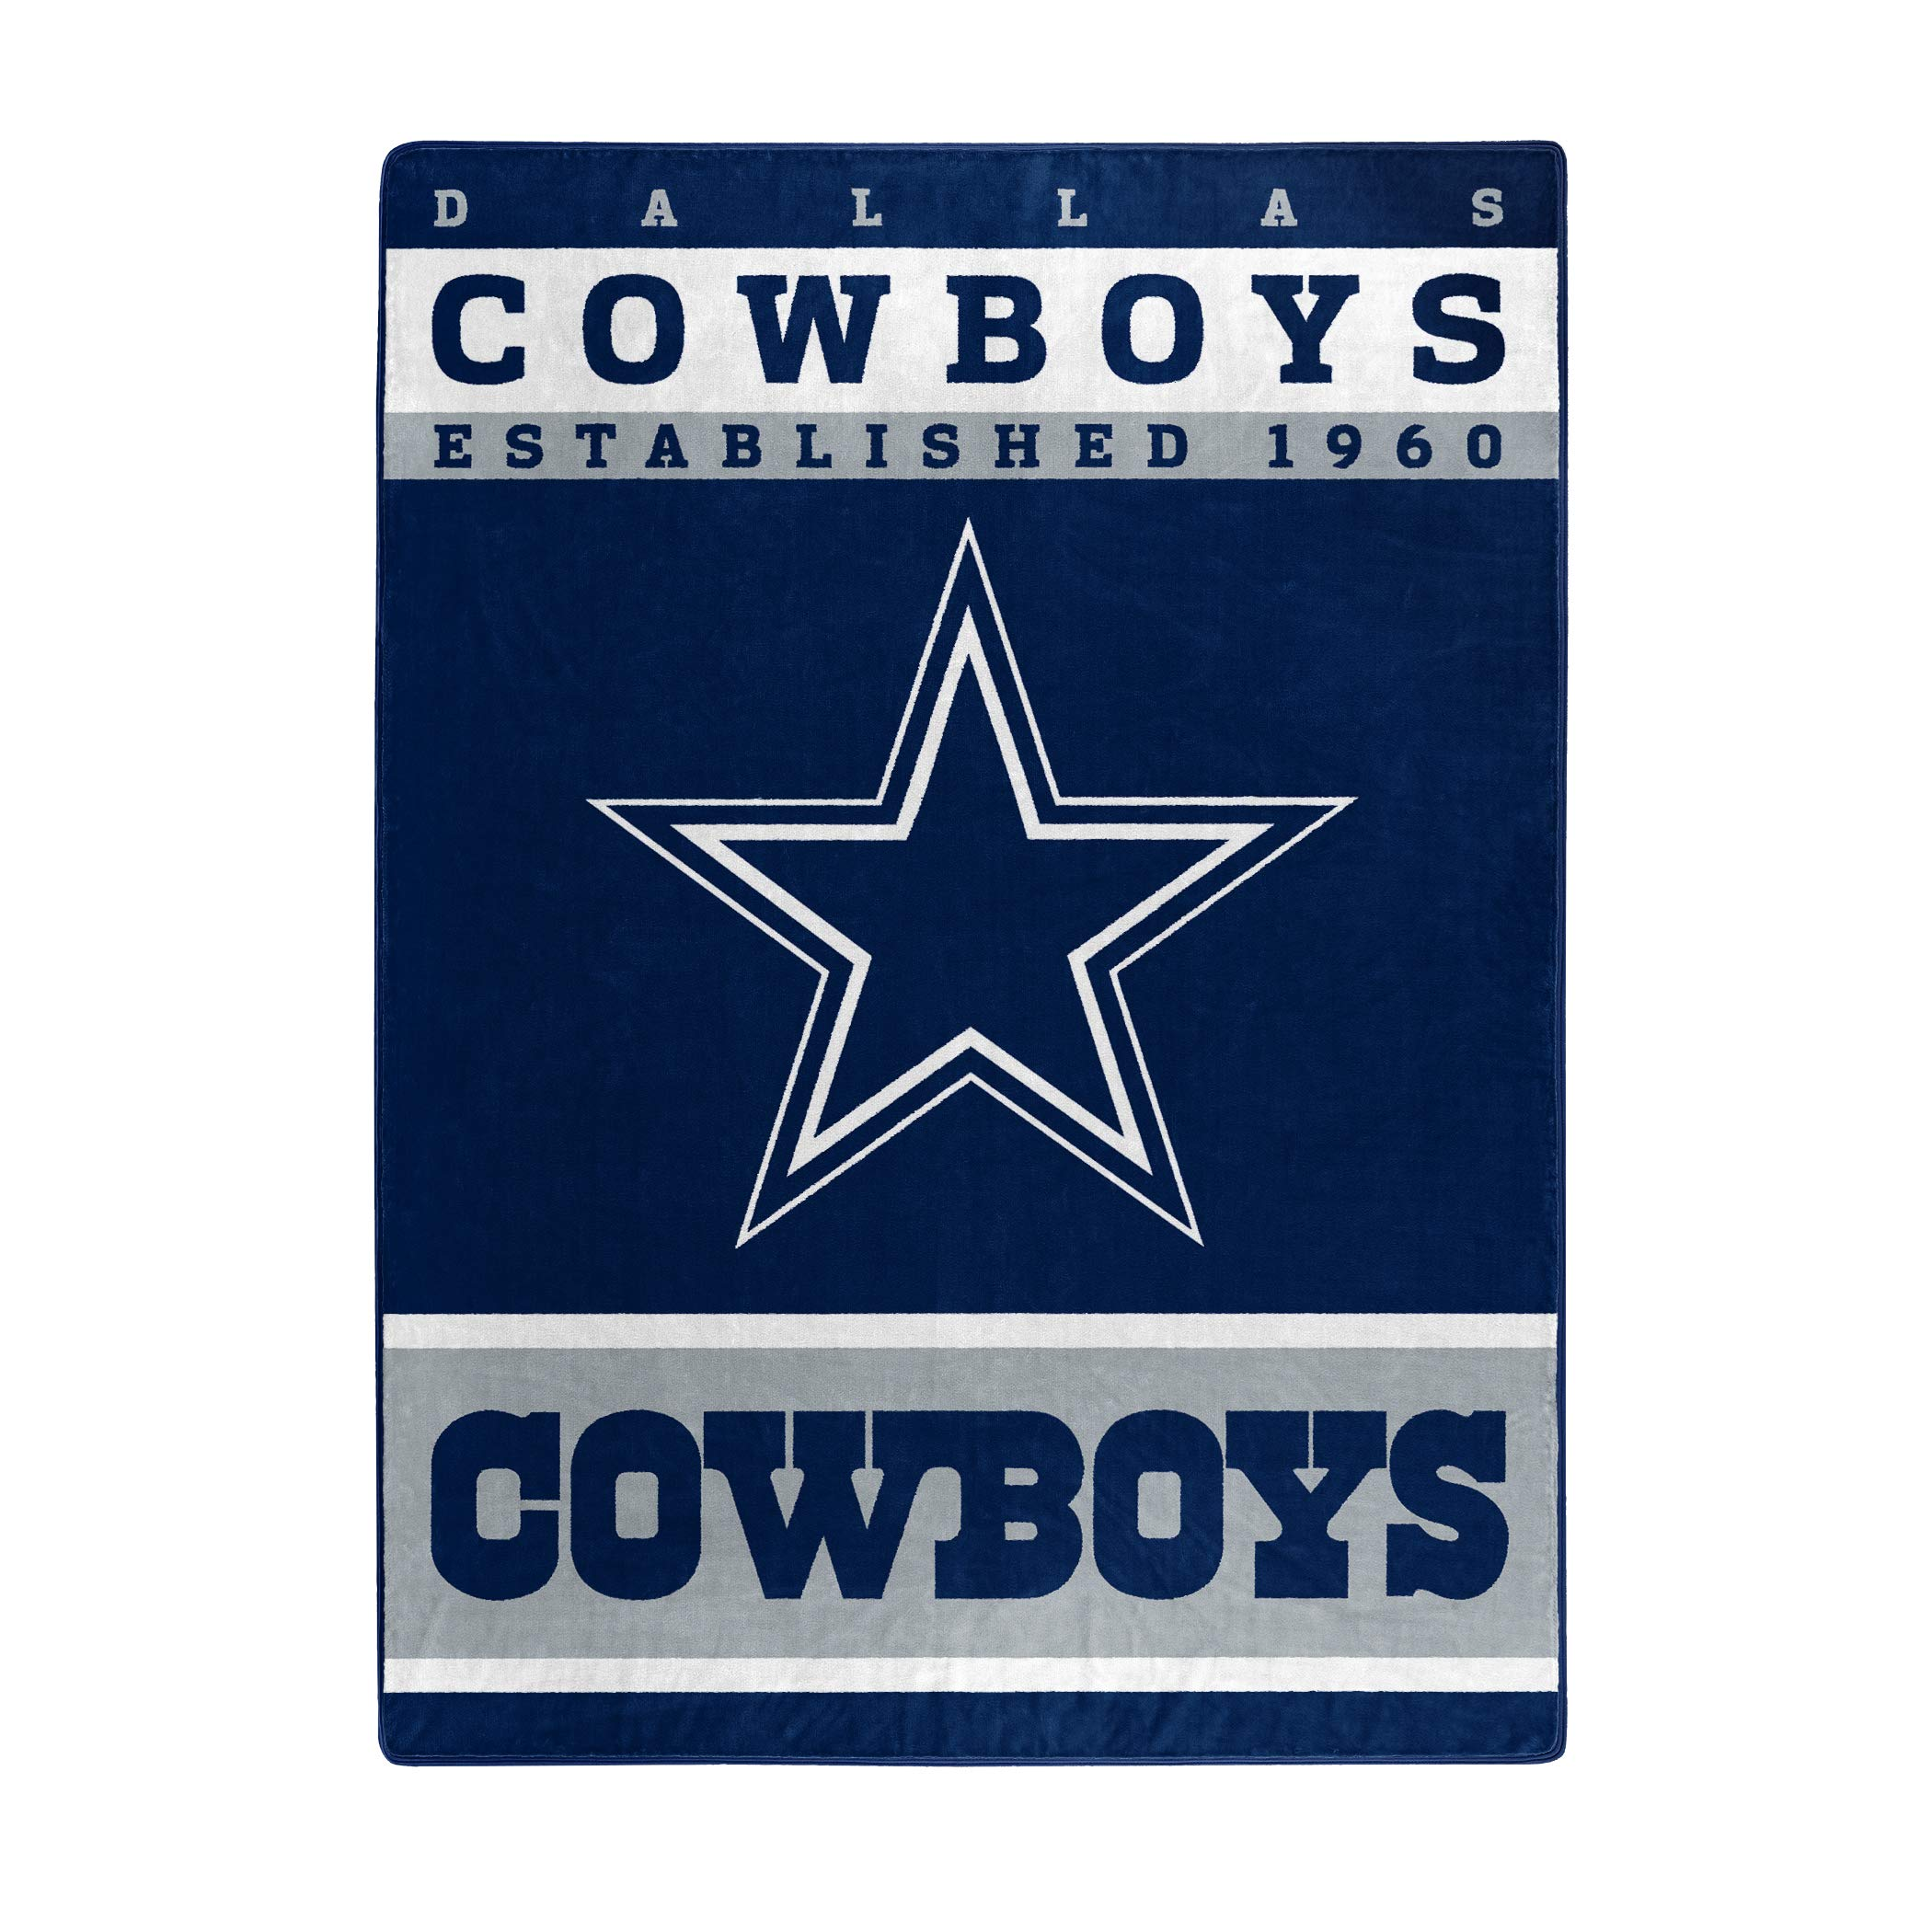 The Northwest Company Officially Licensed NFL Dallas Cowboys 12th Man Plush Raschel Throw Blanket, 60'' x 80''